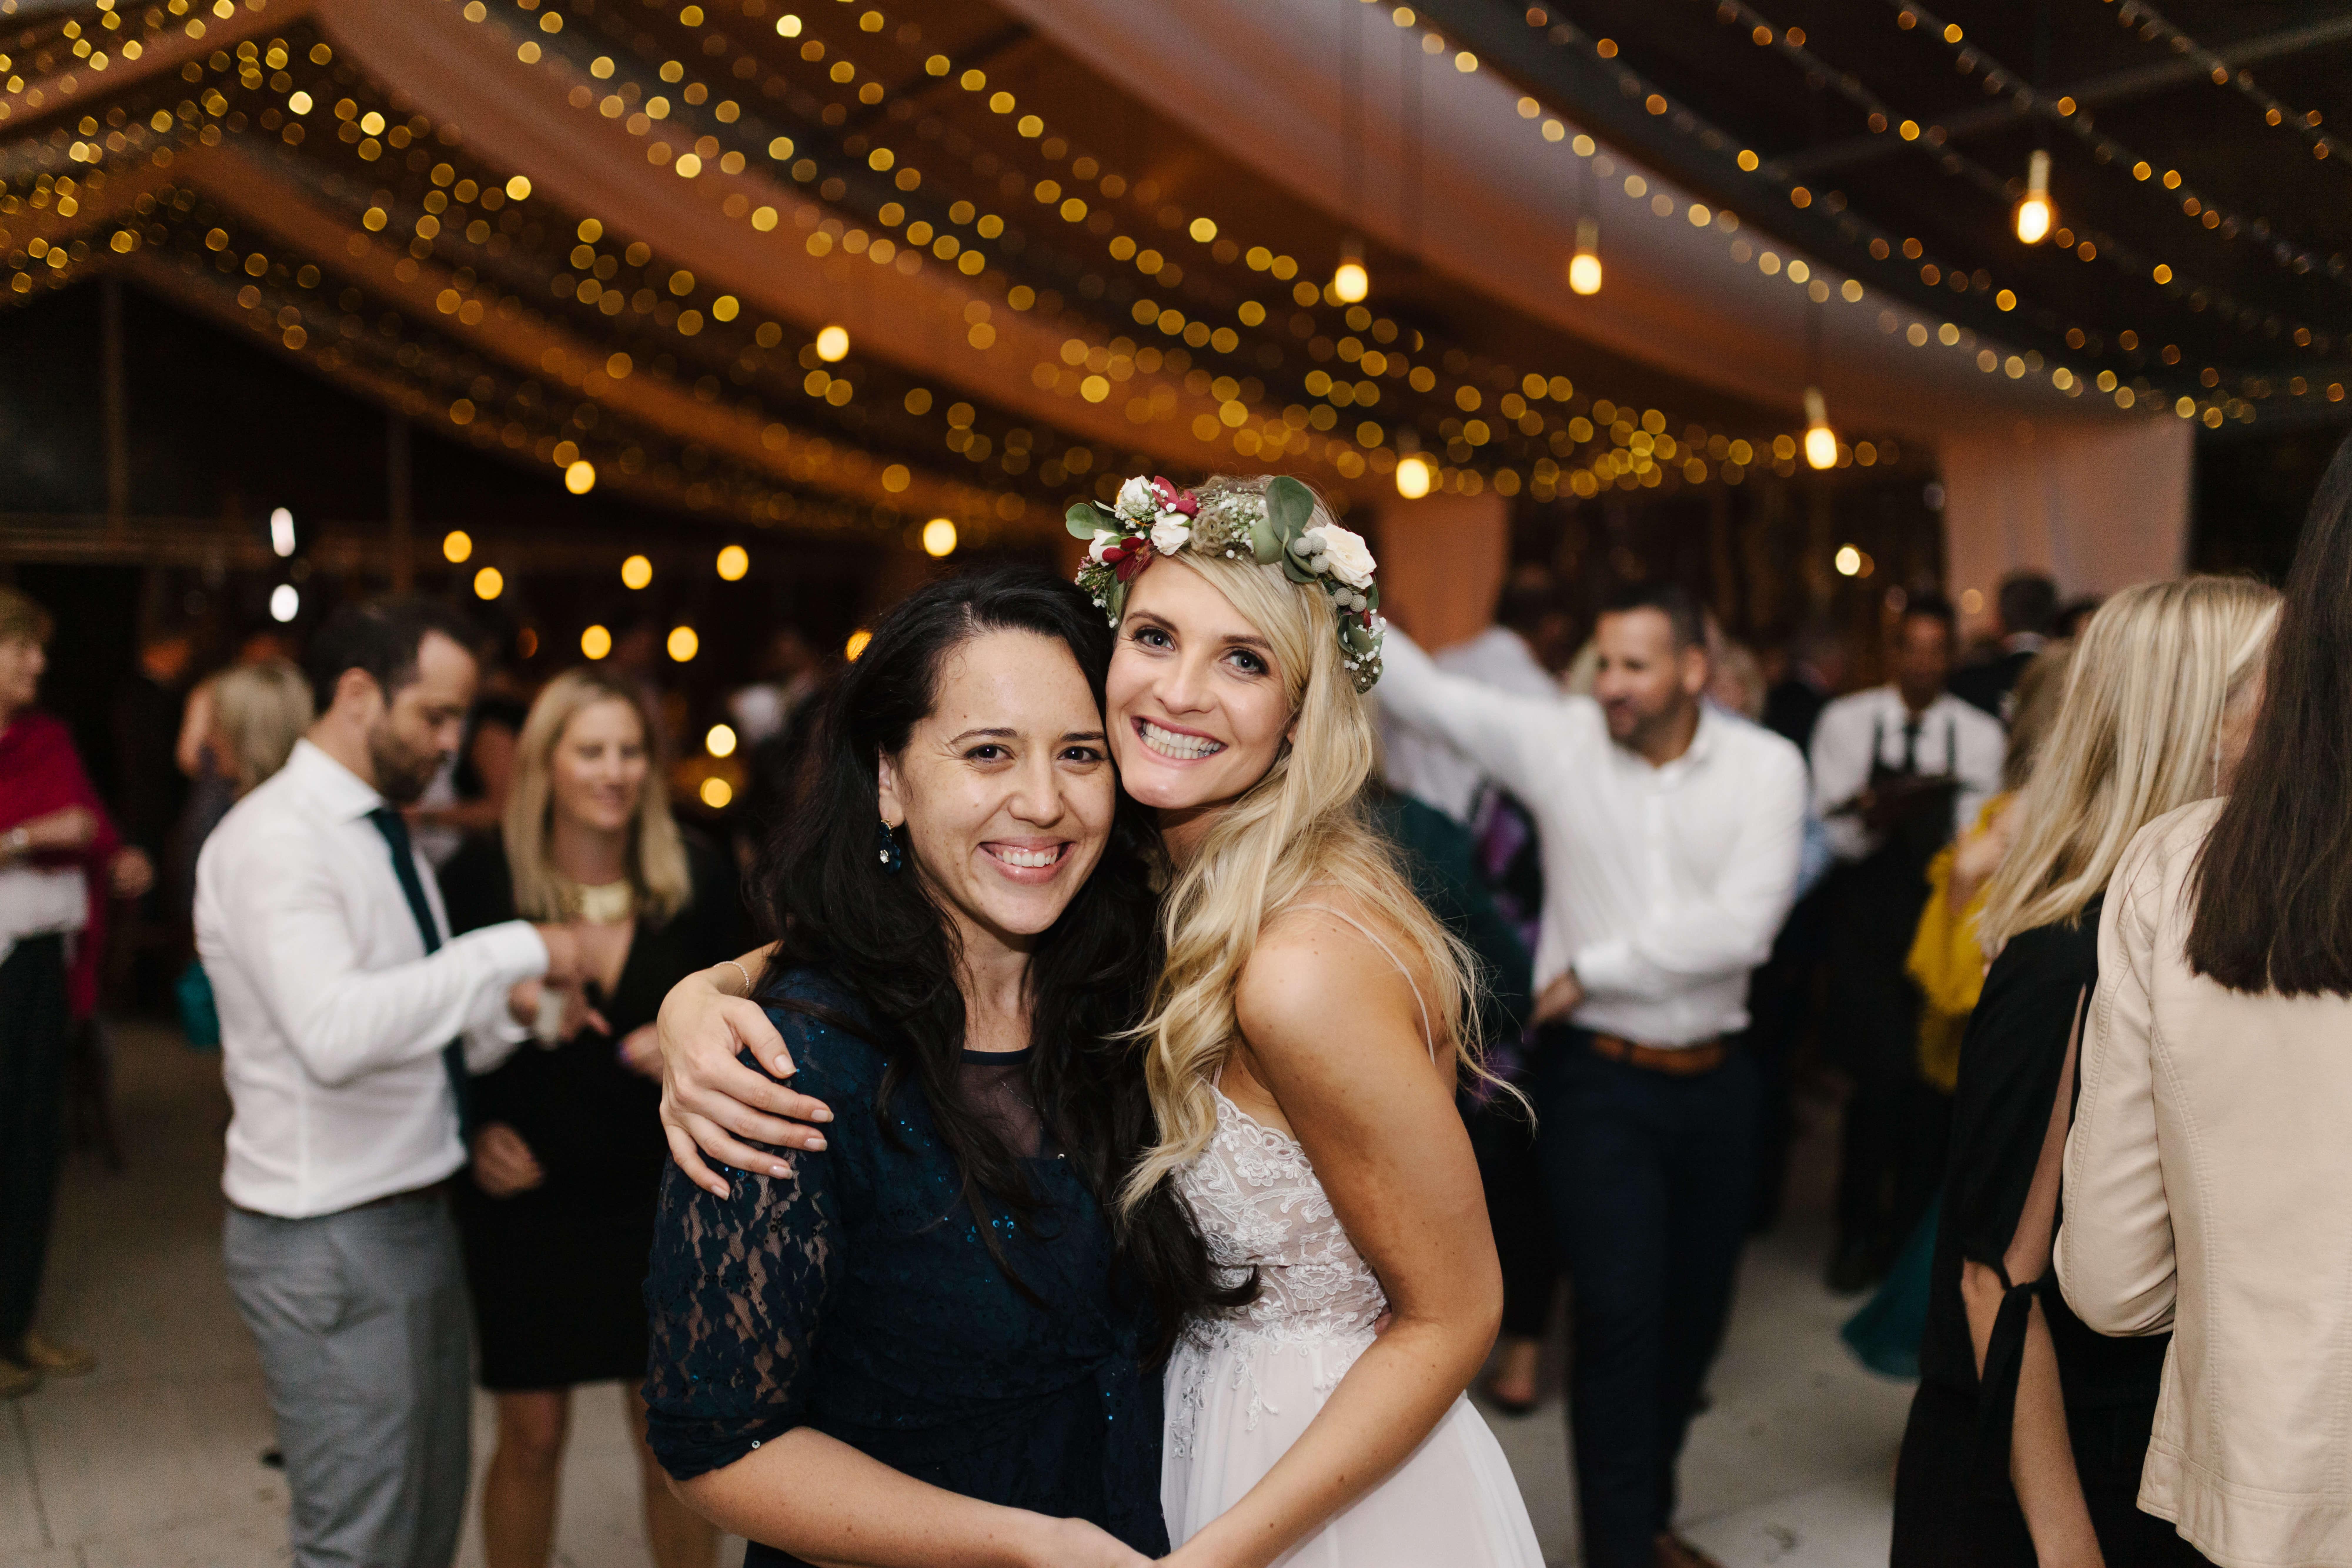 A stunning blonde bride with flowers around her head on a wedding dance floor.